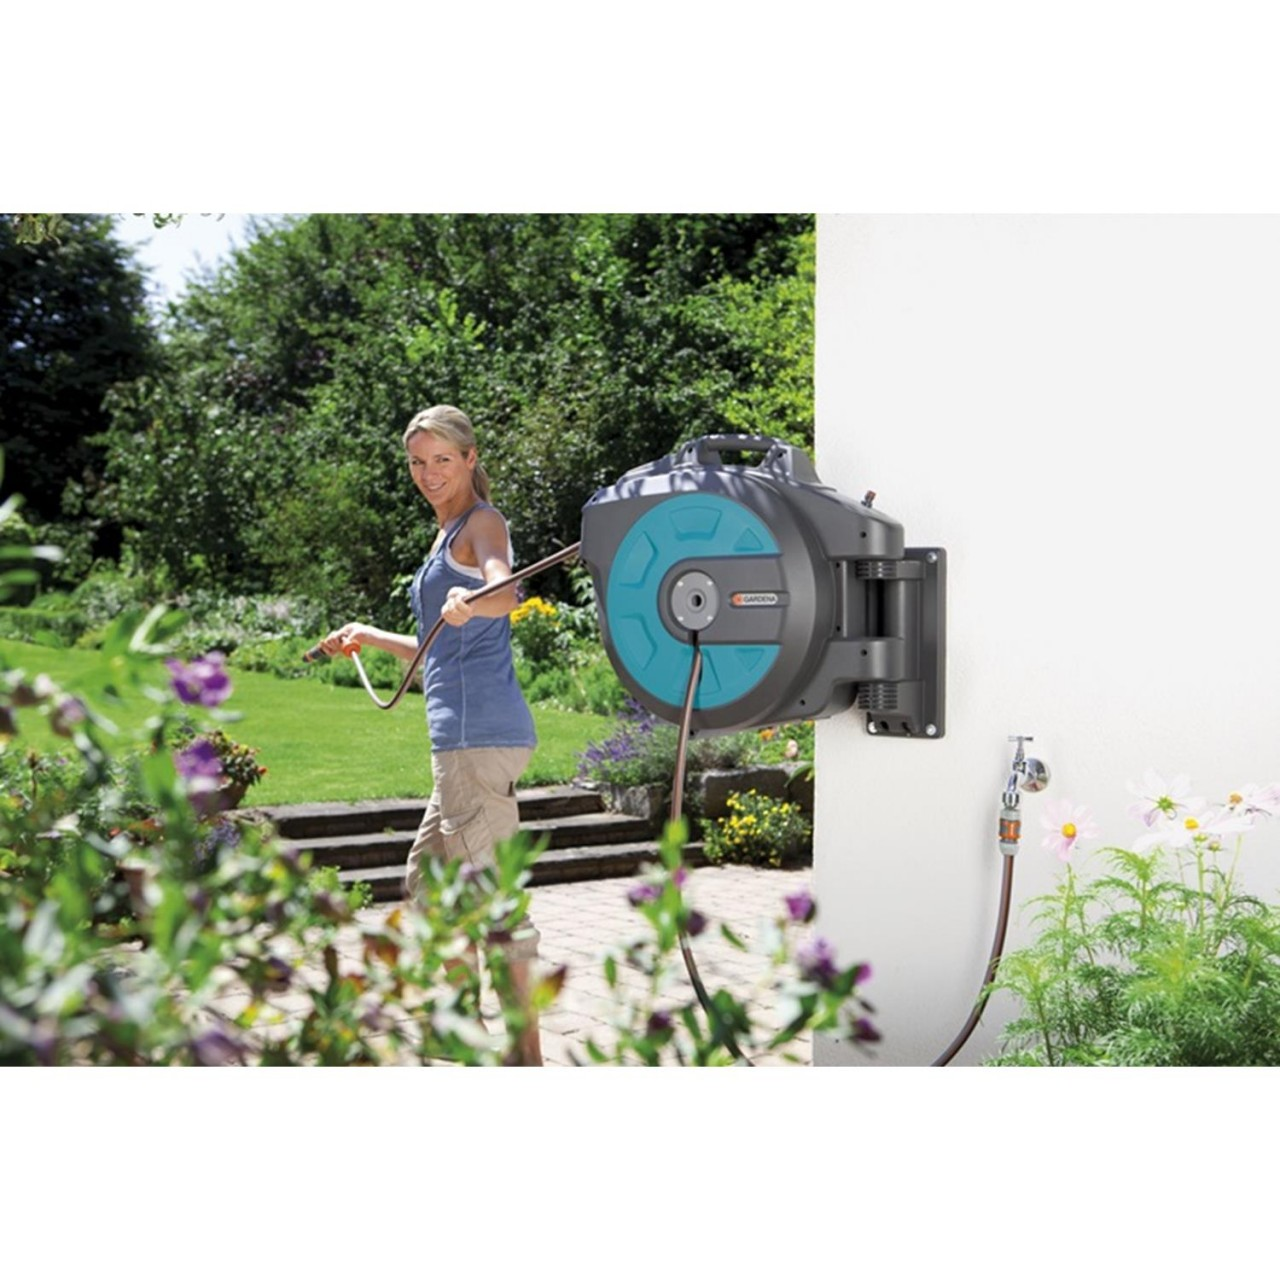 Gardena Wand-Schlauchbox 25 roll-up automatic 8023-20 ...